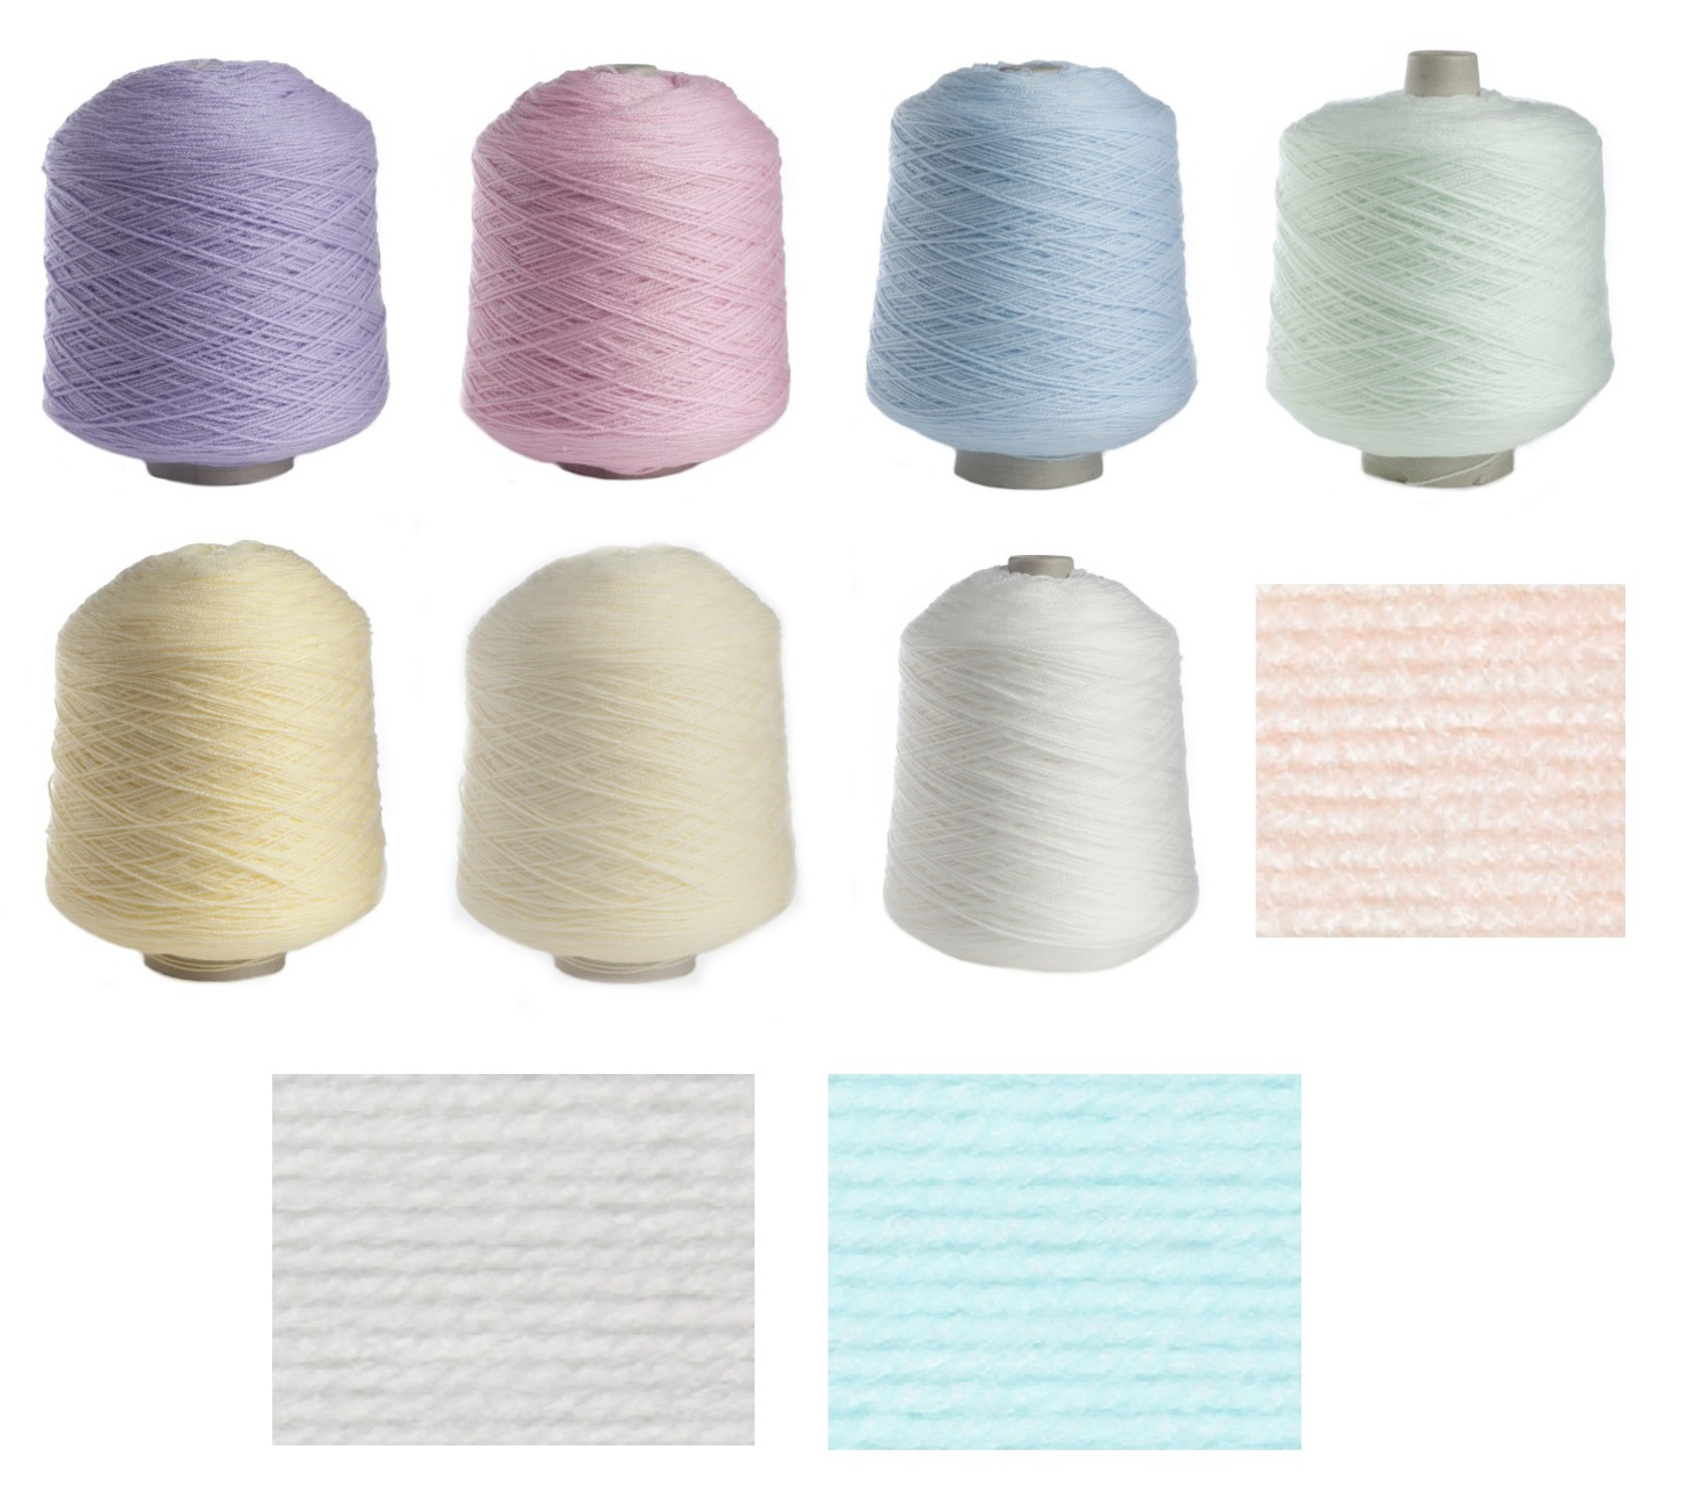 James Brett 500g Baby 4 Ply Pastel Cone Acrylic Hand or Machine Knitting Wool